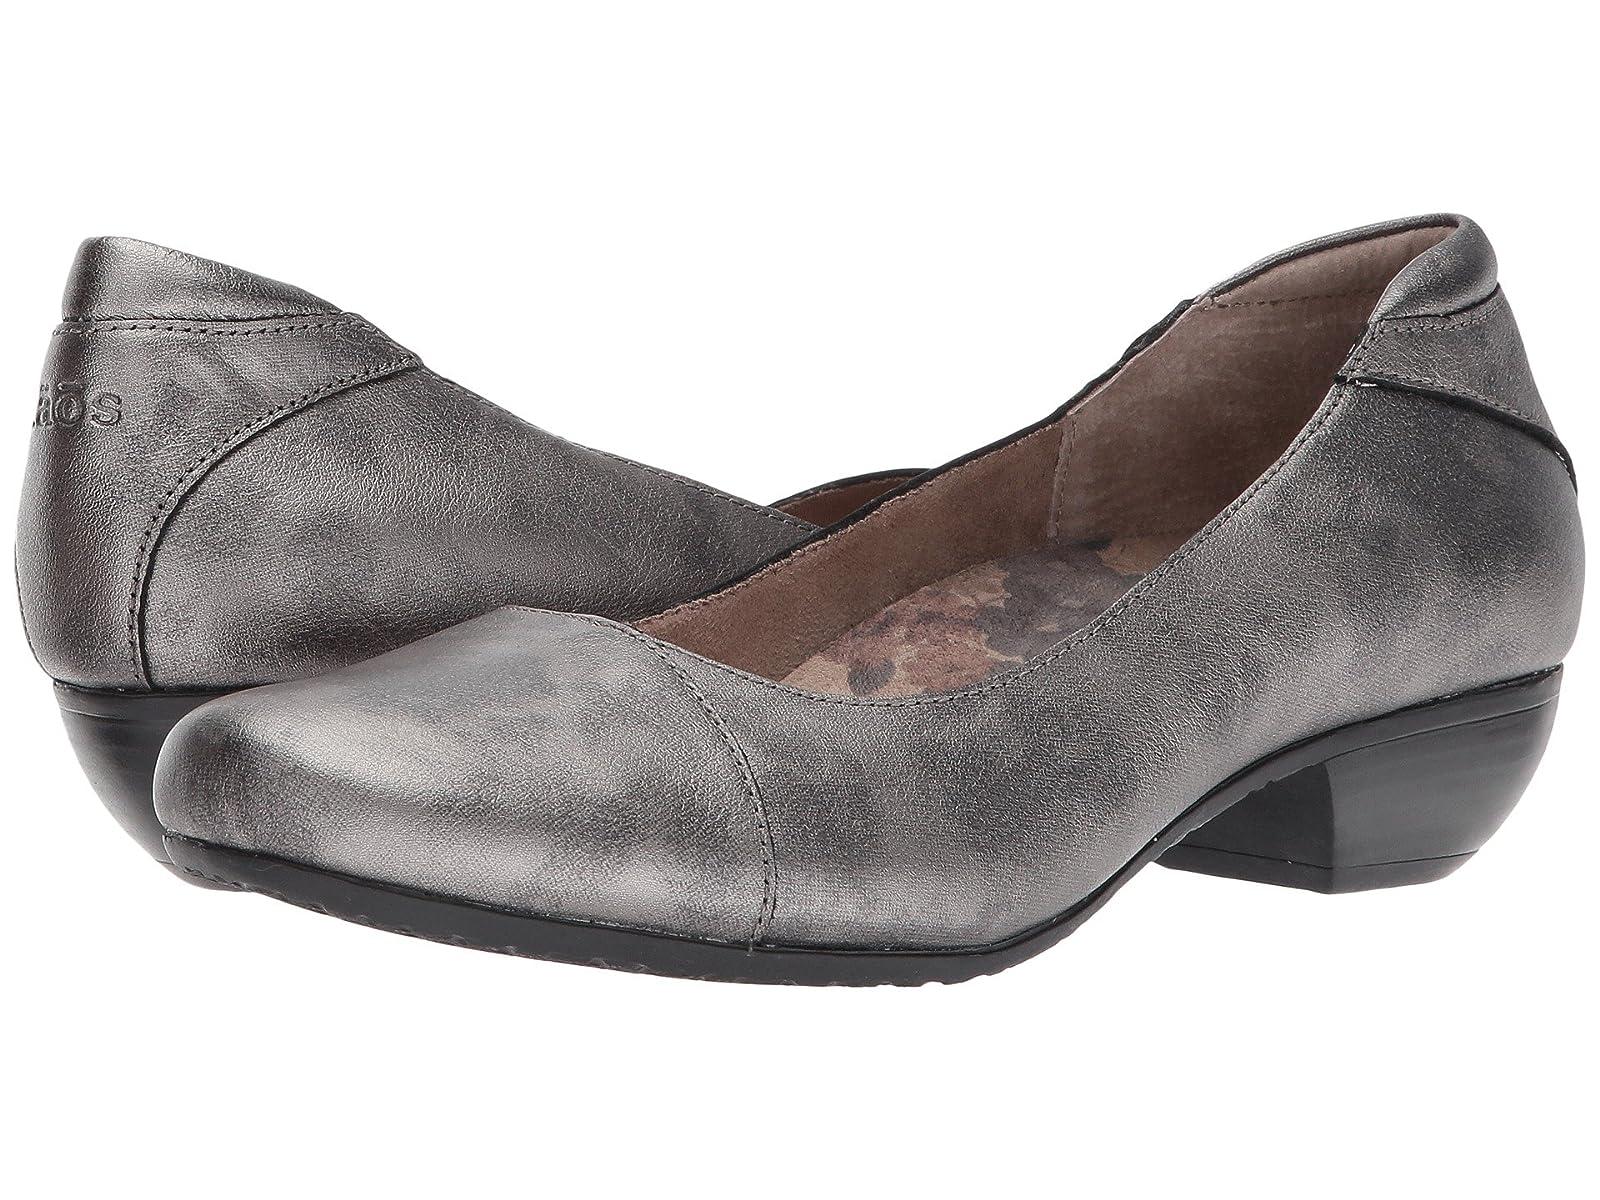 Taos Footwear DebutAtmospheric grades have affordable shoes